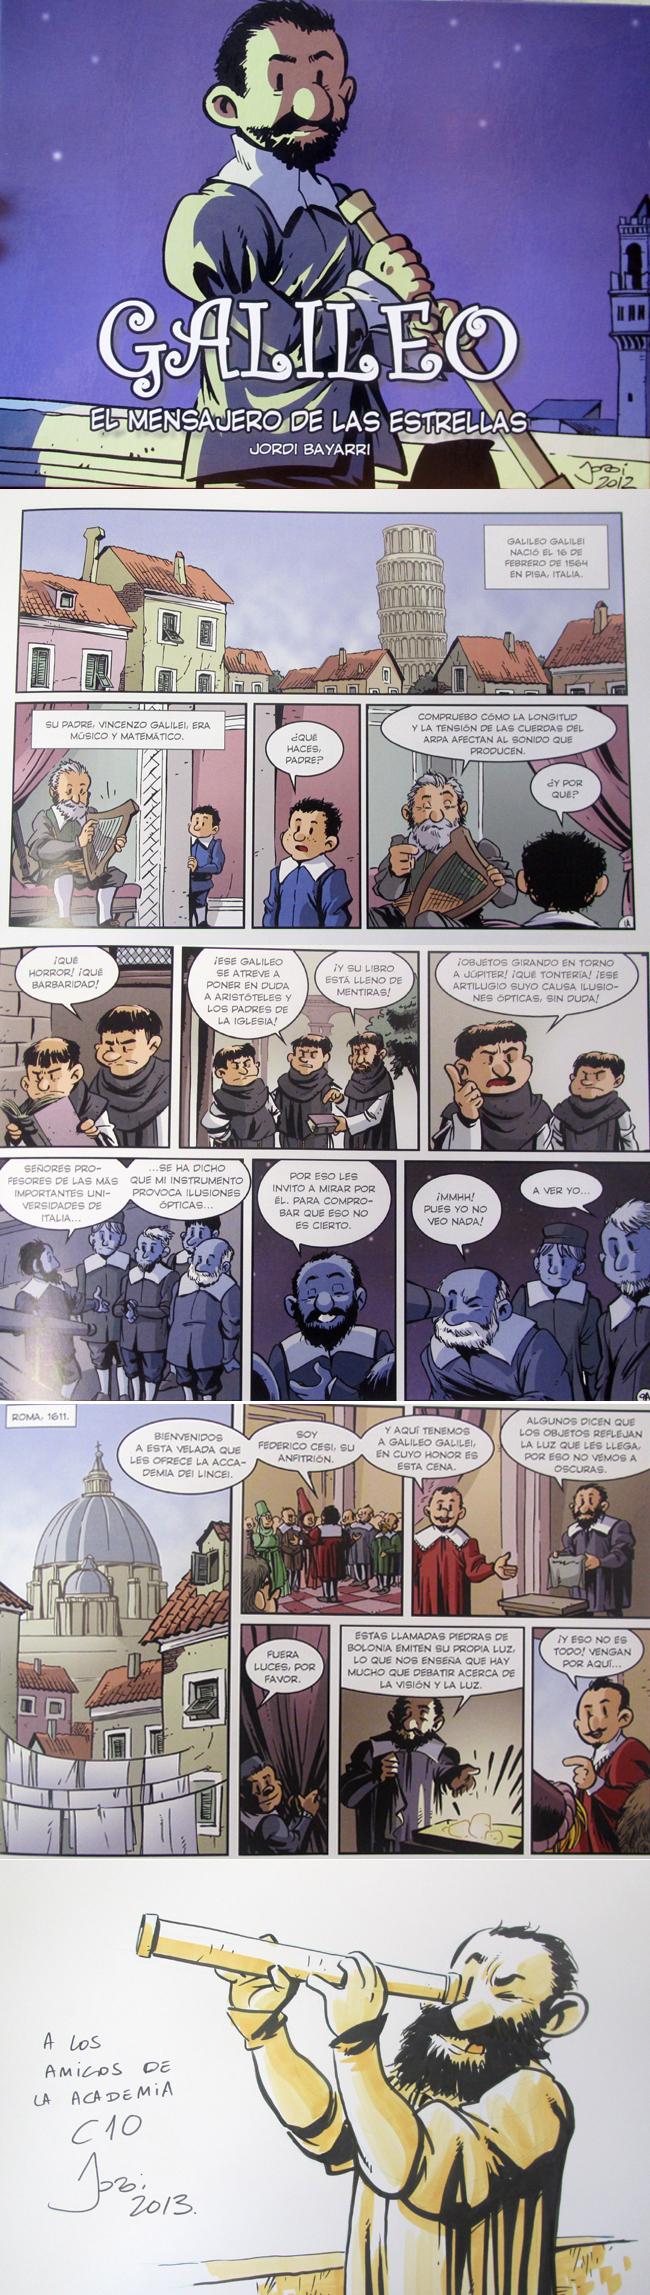 jordi-bayarri-galileo-regalo-academiac10-comic-divulgativo